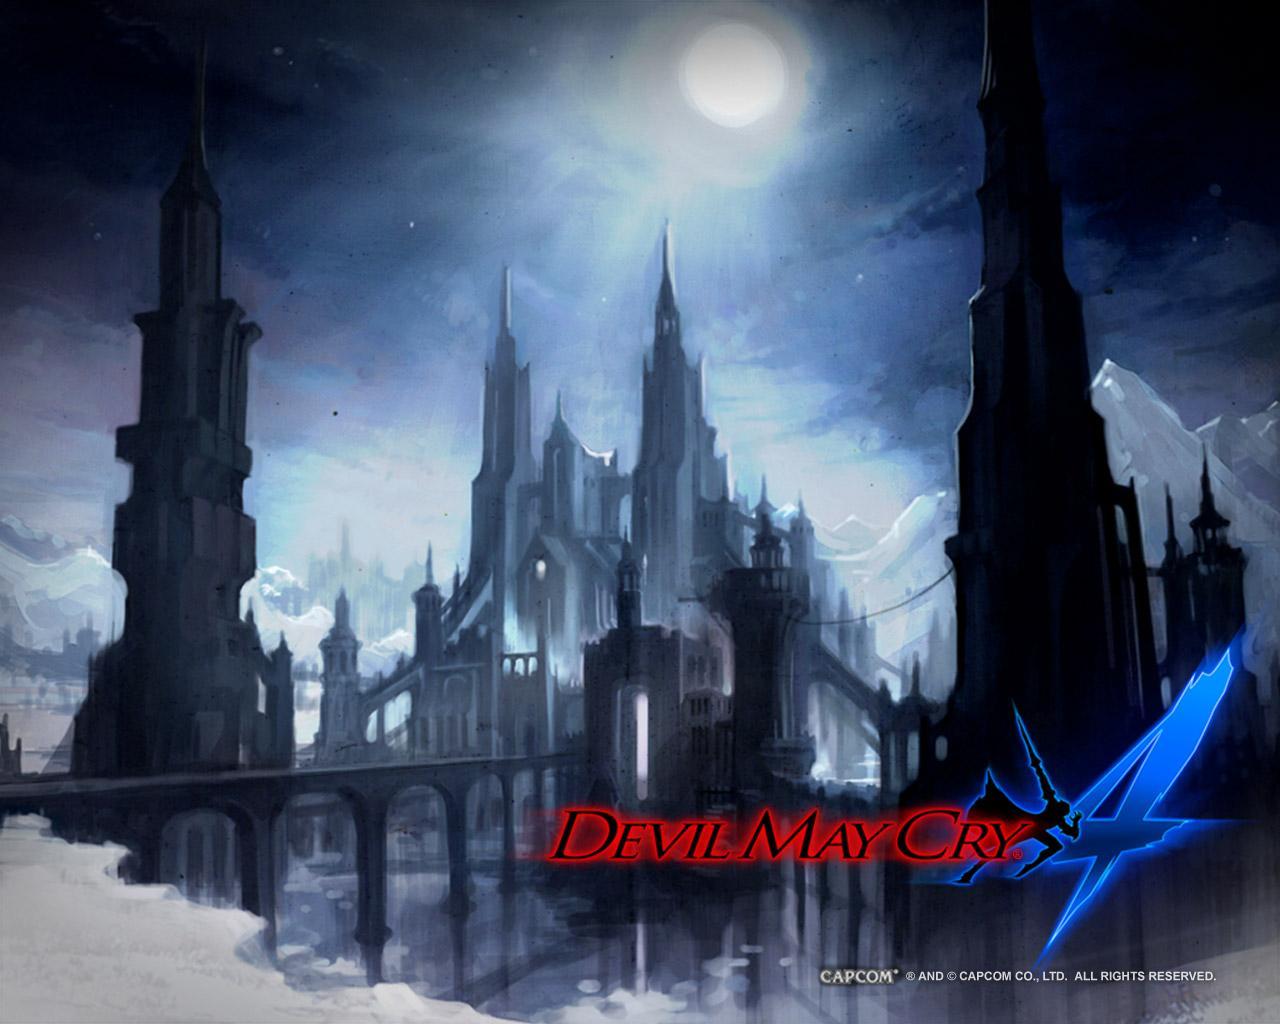 http://2.bp.blogspot.com/_OAAXWGB-kzE/S_cfsRRfXqI/AAAAAAAAAGI/2HLWnq2fjBs/s1600/devilmaycry4_wallpaper_1.jpg